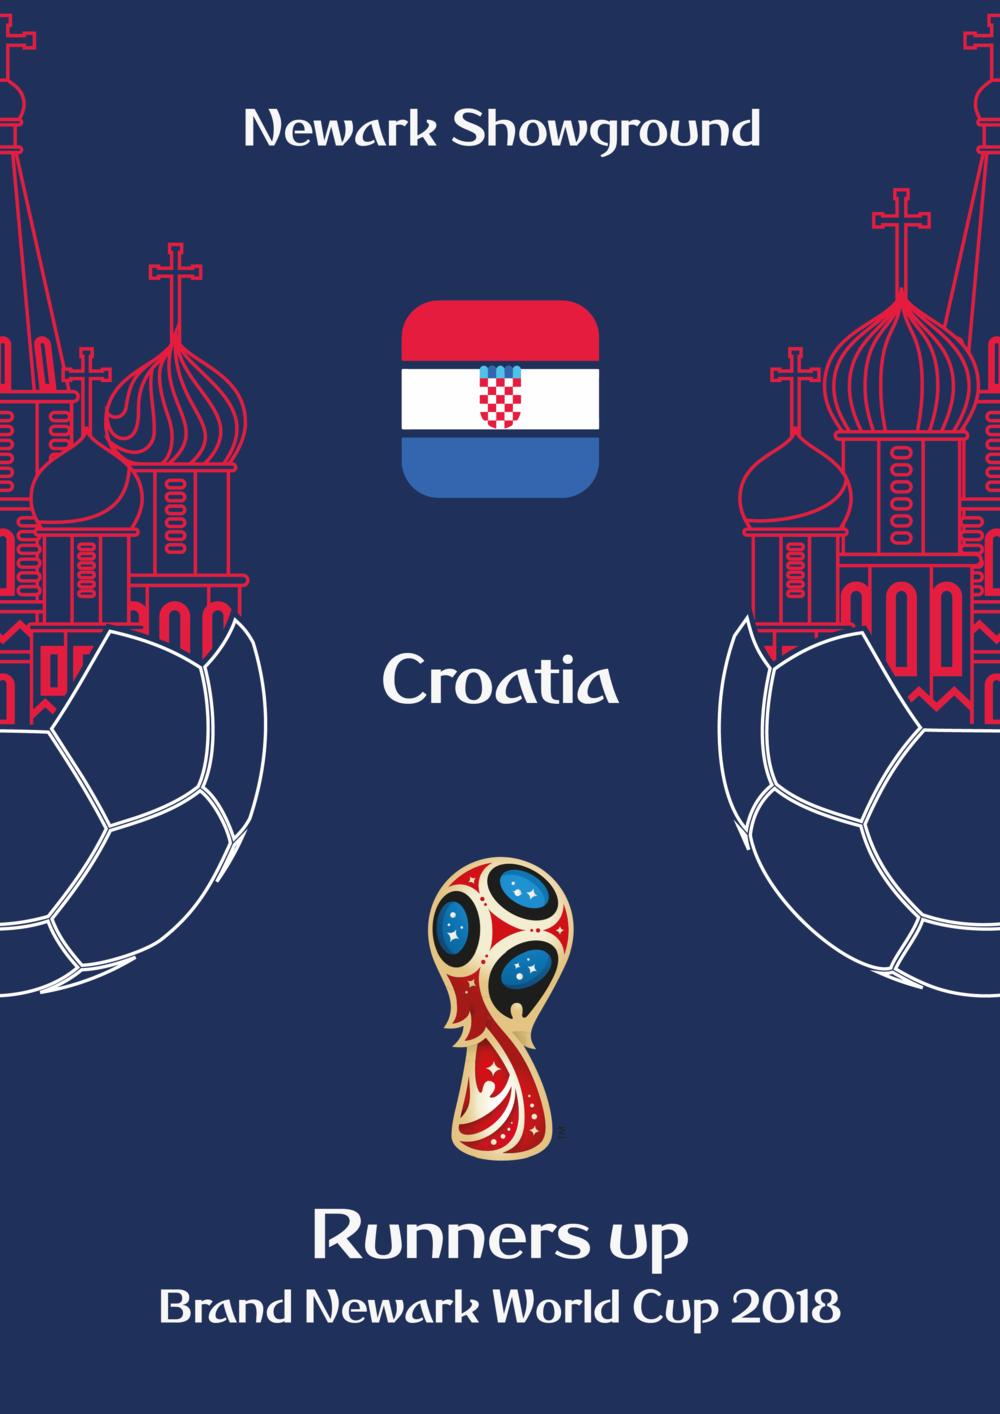 Croatia certificate-01.png